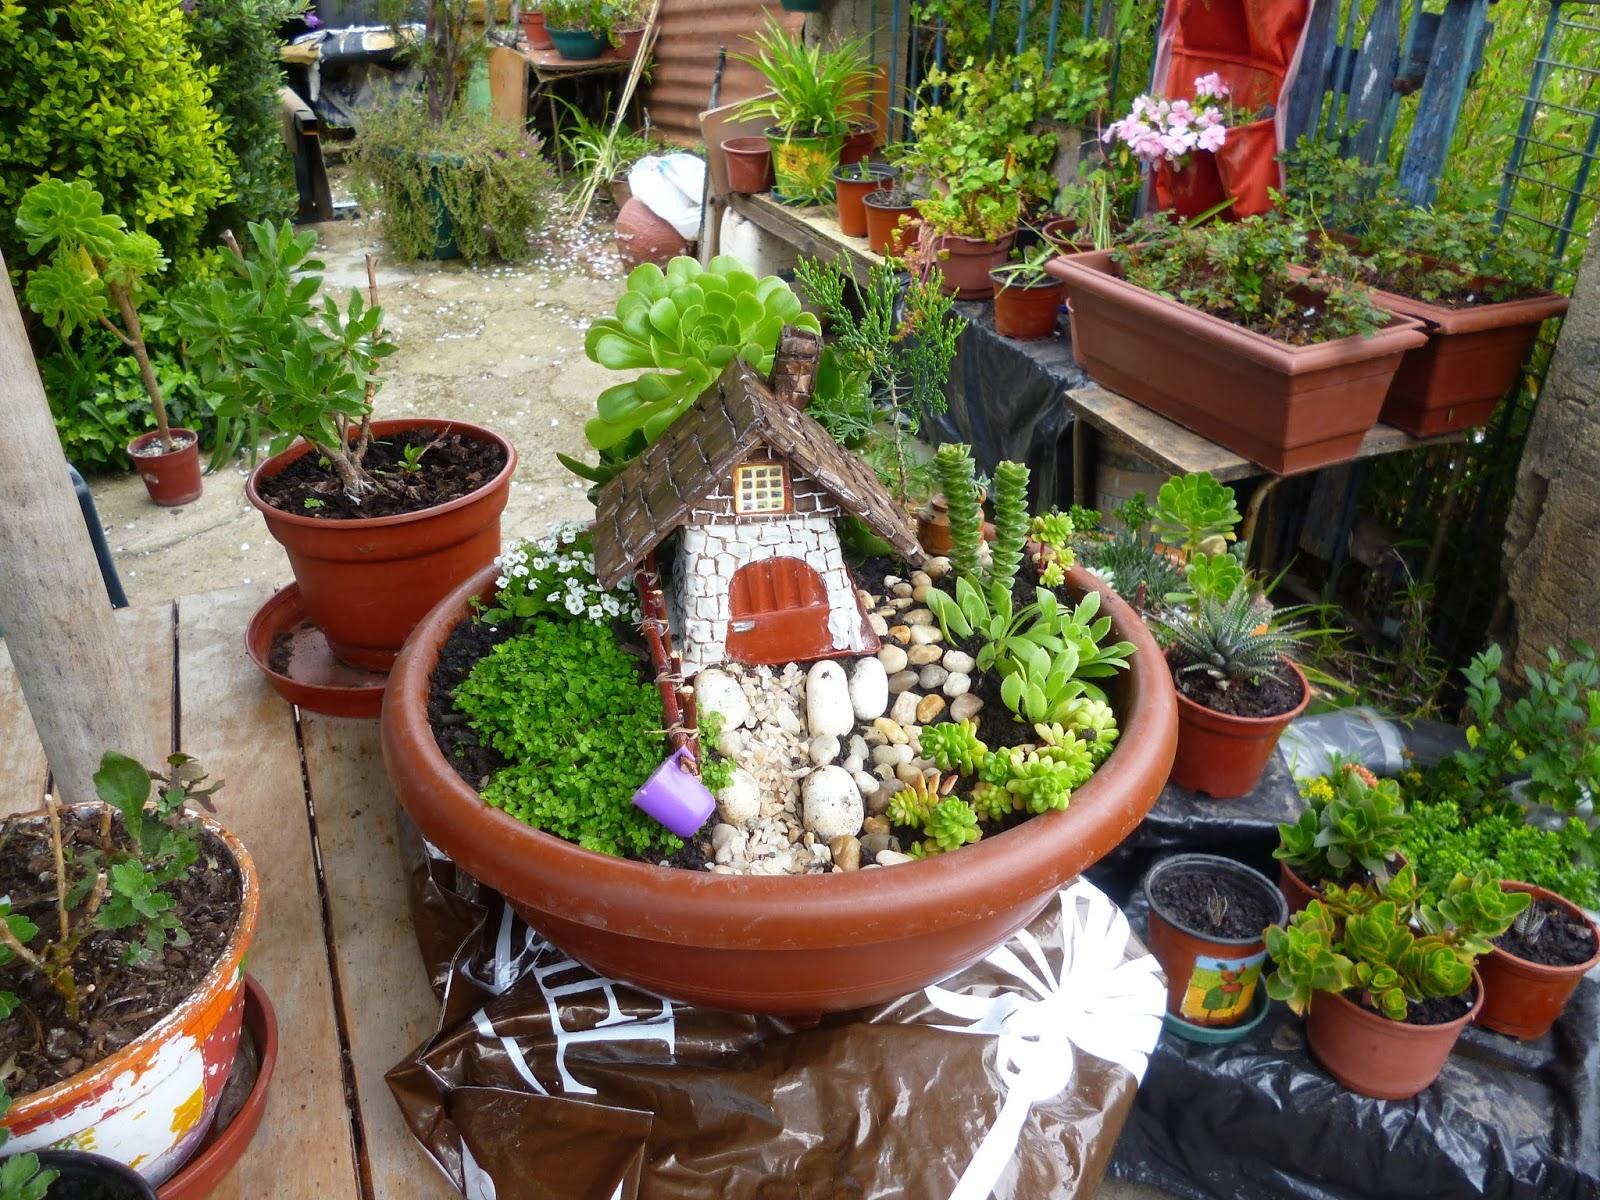 Manualidades para jard n cositasconmesh for Casas de pvc para jardin